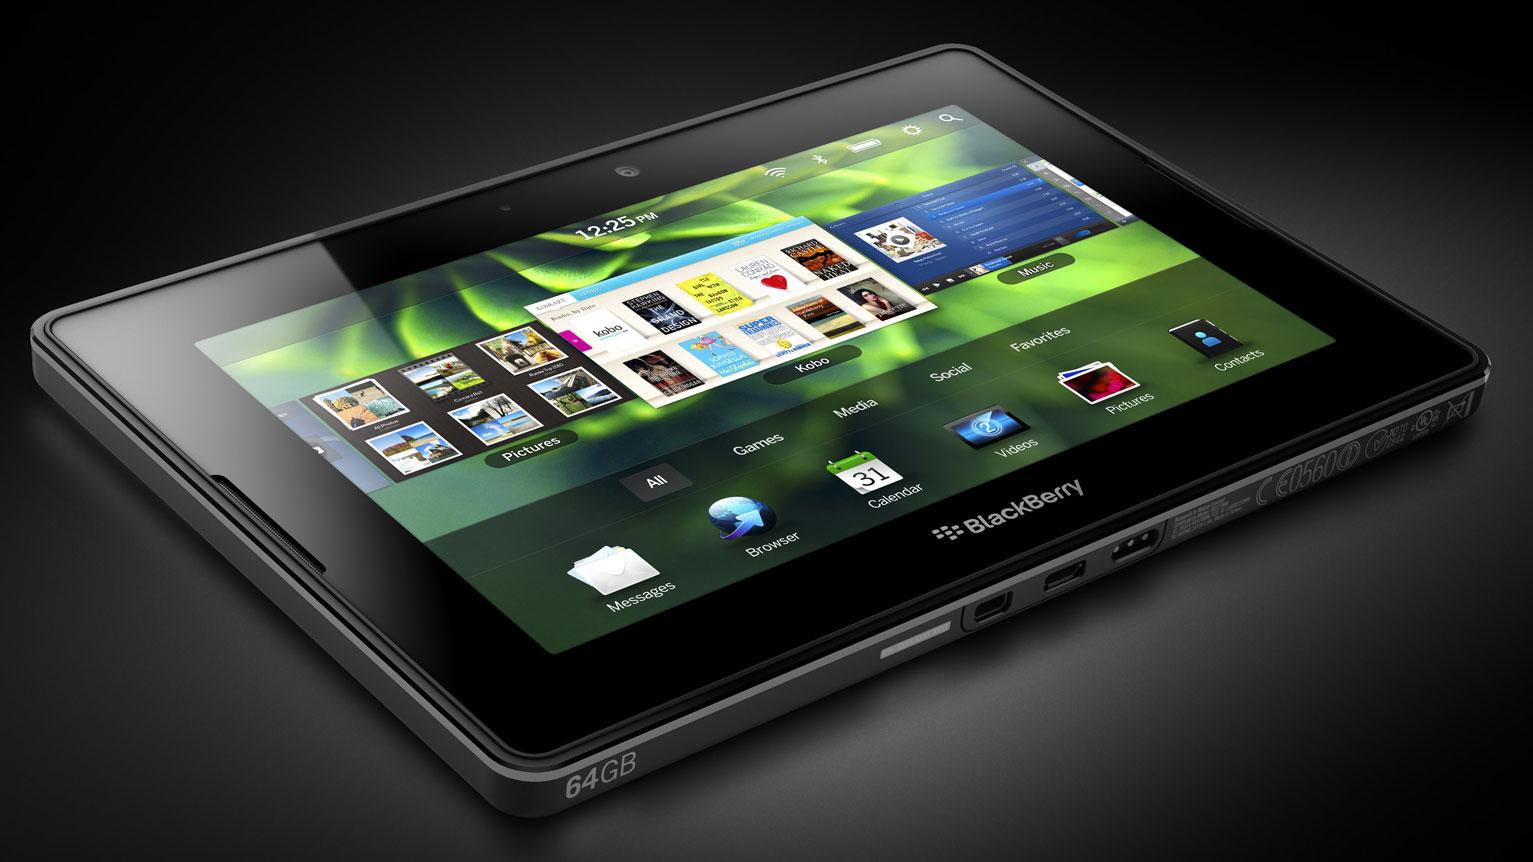 BlackBerry Playbook 64GB gets hefty UK price cut   TechRadar